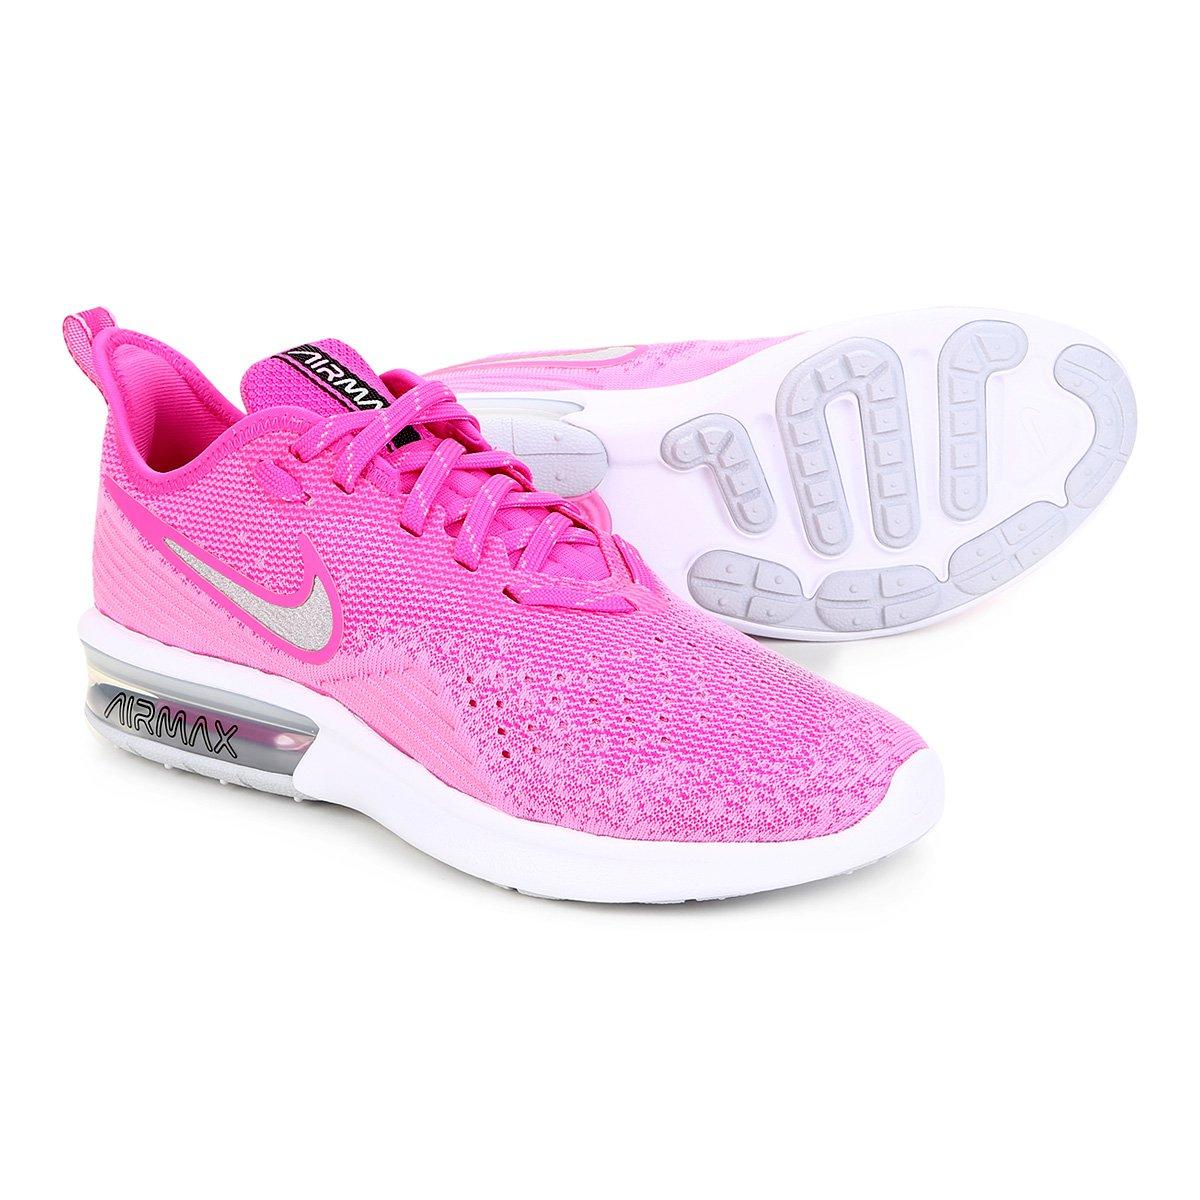 Tênis Nike Air Max Sequent 4 Feminino Rosa Loja Do Inter